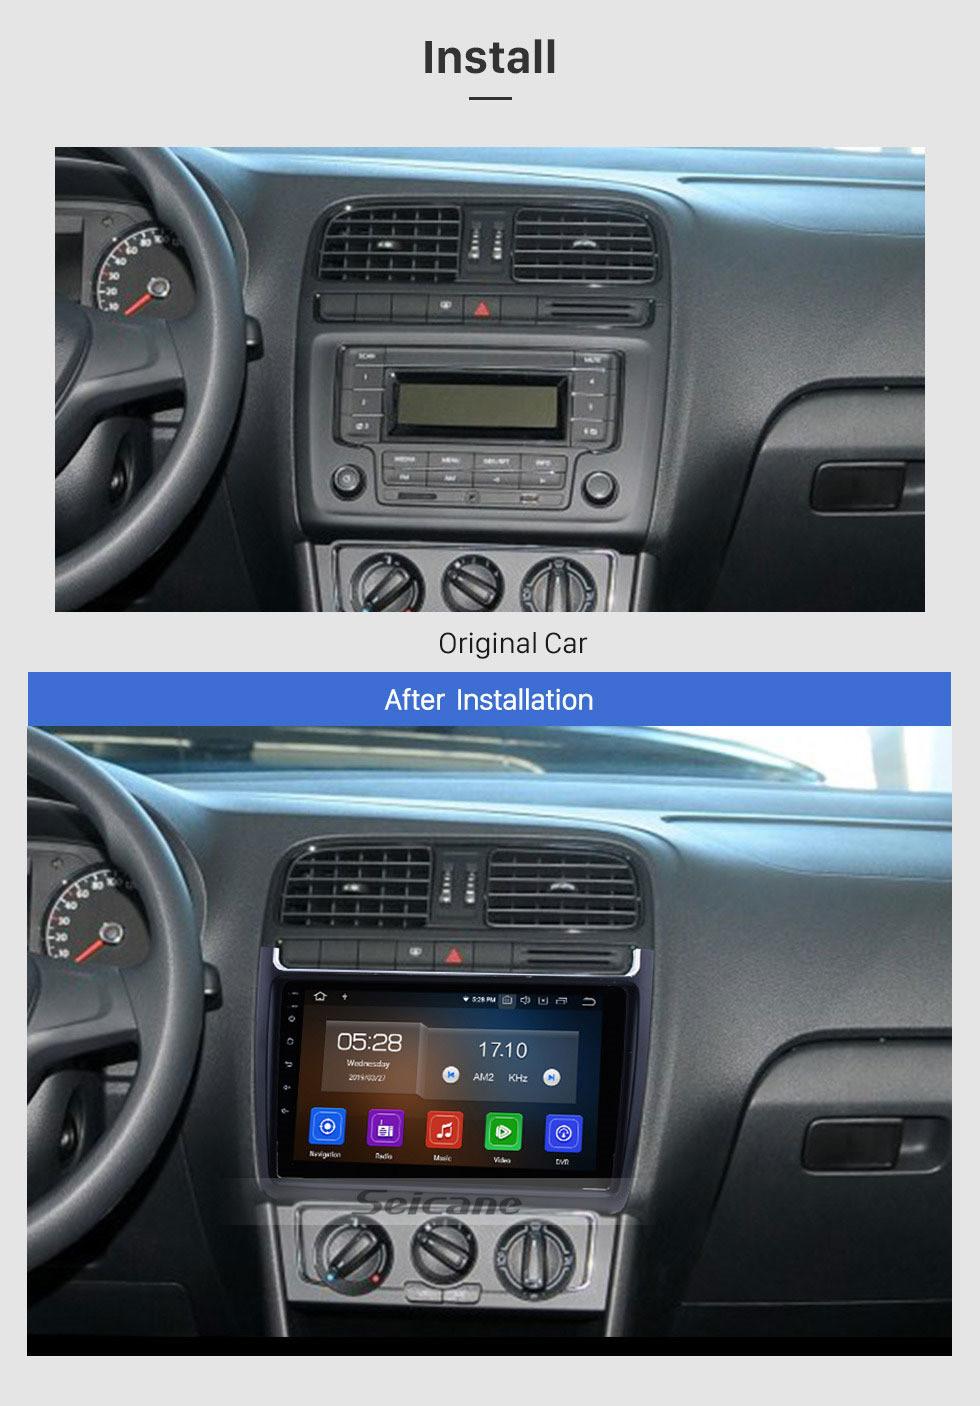 Seicane 2012-2015 VW Volkswagen POLO 9 inch Android 10.0 HD 1024*600 Touchscreen Radio GPS Navigation Bluetooth Music Audio USB WIFI 1080P Mirror link Backup Camera SWC Carplay